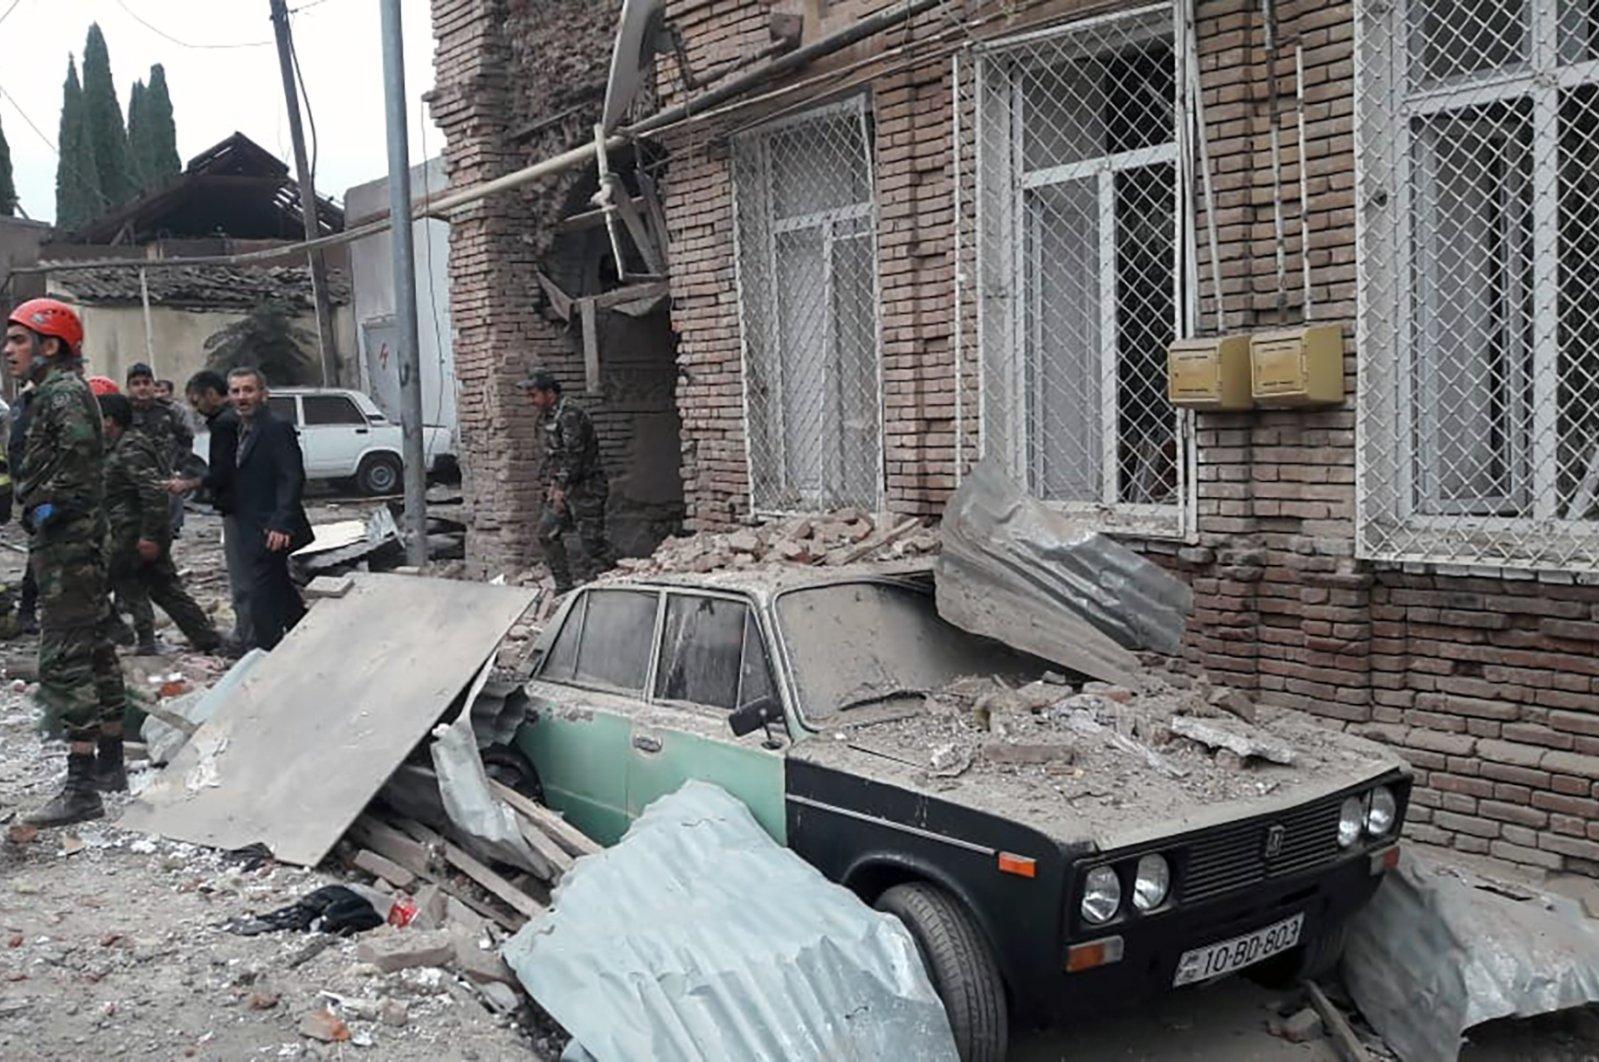 Emergency personnel work at the site of an Armenian rocket strike in Ganja, Azerbaijan, Oct. 4, 2020. (Azerbaijani Presidency/AFP)